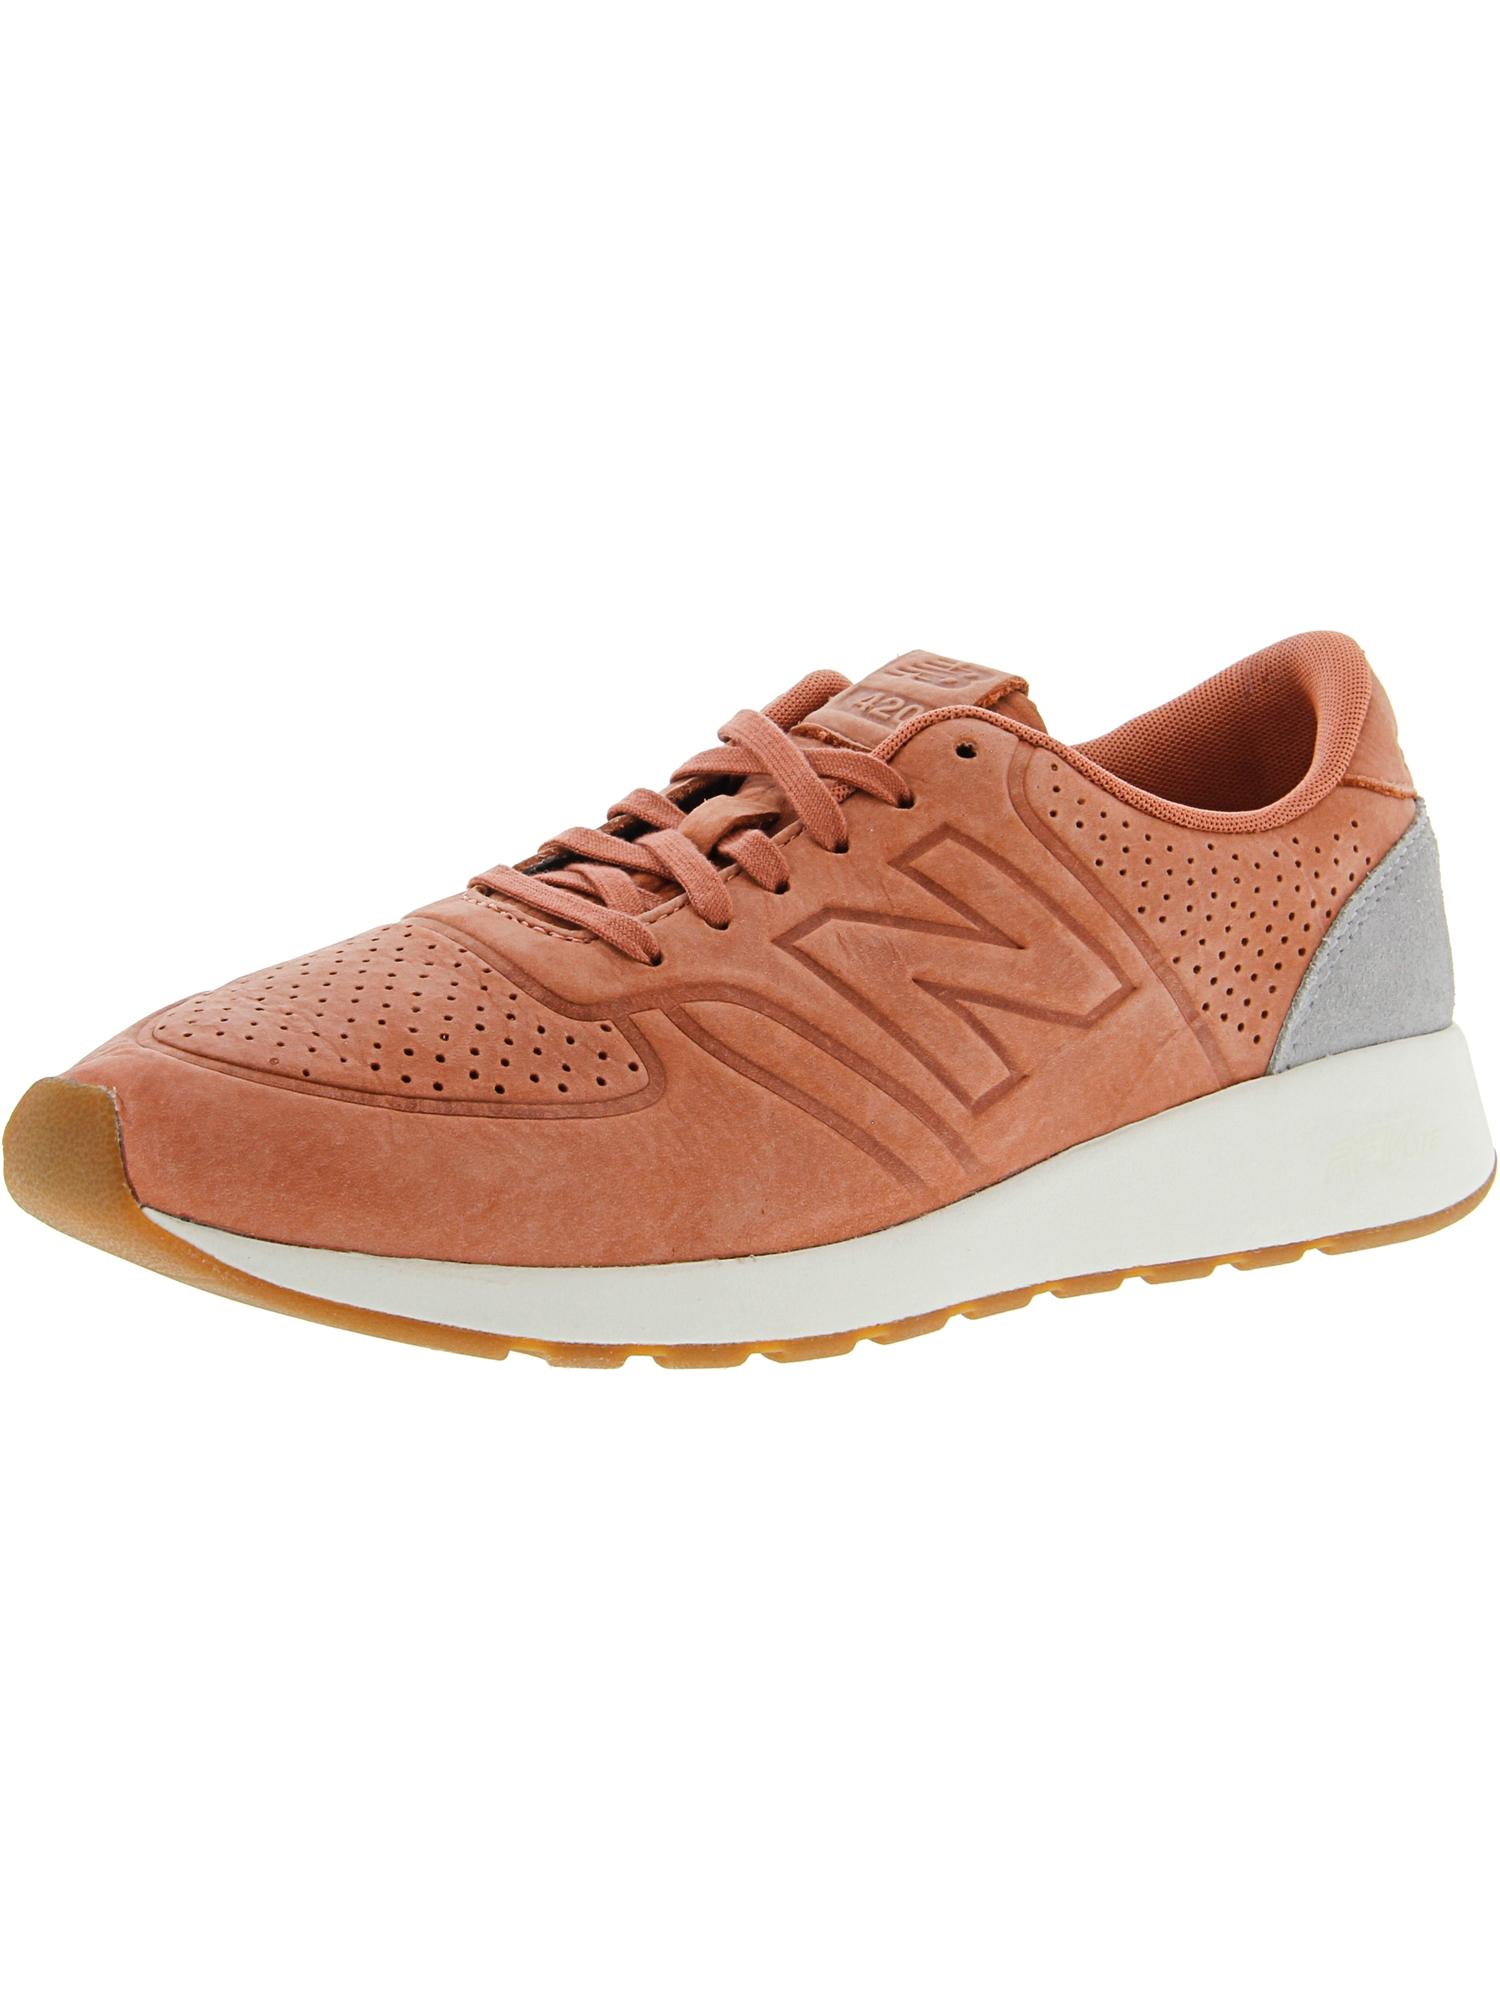 New Balance Men's Mrl420 Dg Ankle-High Leather Fashion Sneaker - 8.5M